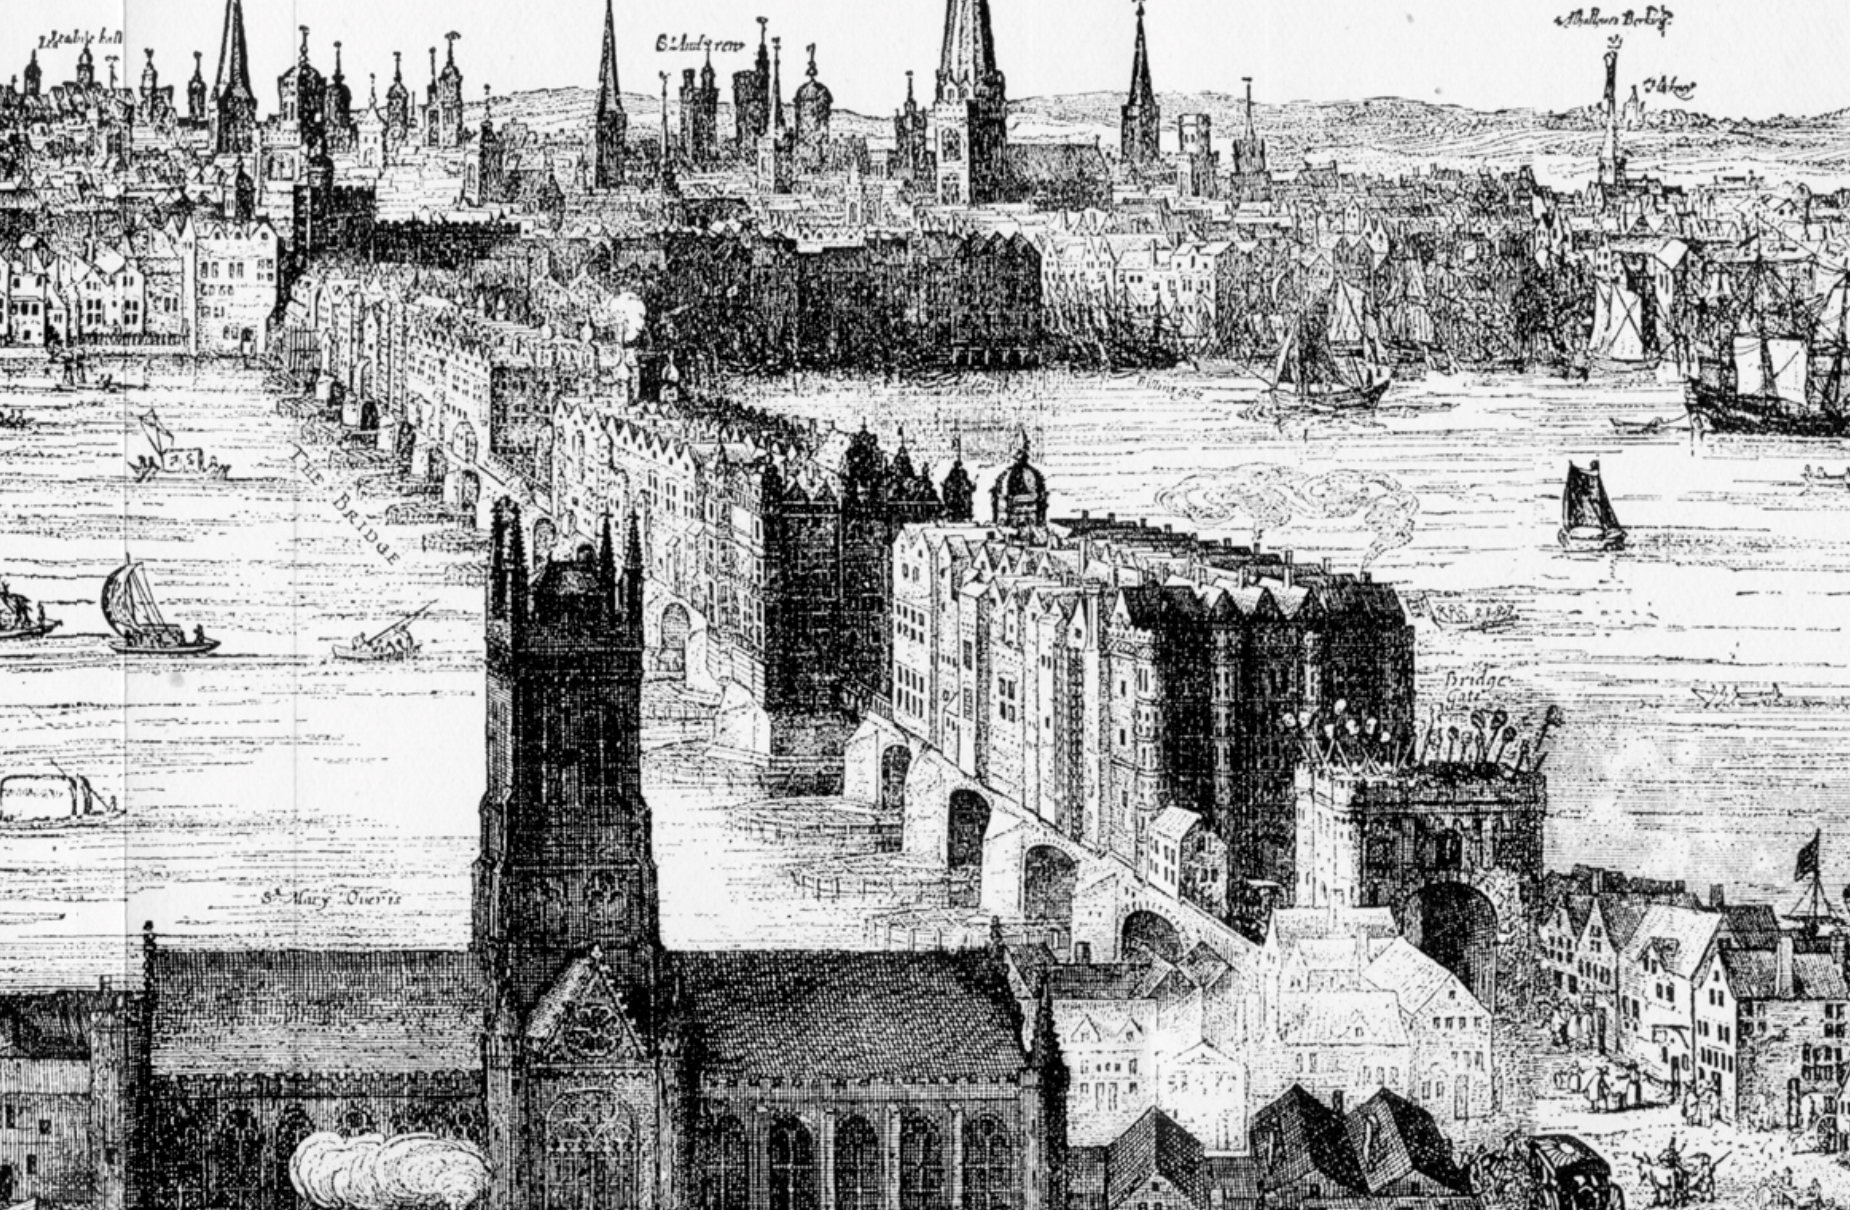 http://upload.wikimedia.org/wikipedia/commons/b/b7/London_Bridge_(1616)_by_Claes_Van_Visscher.jpg